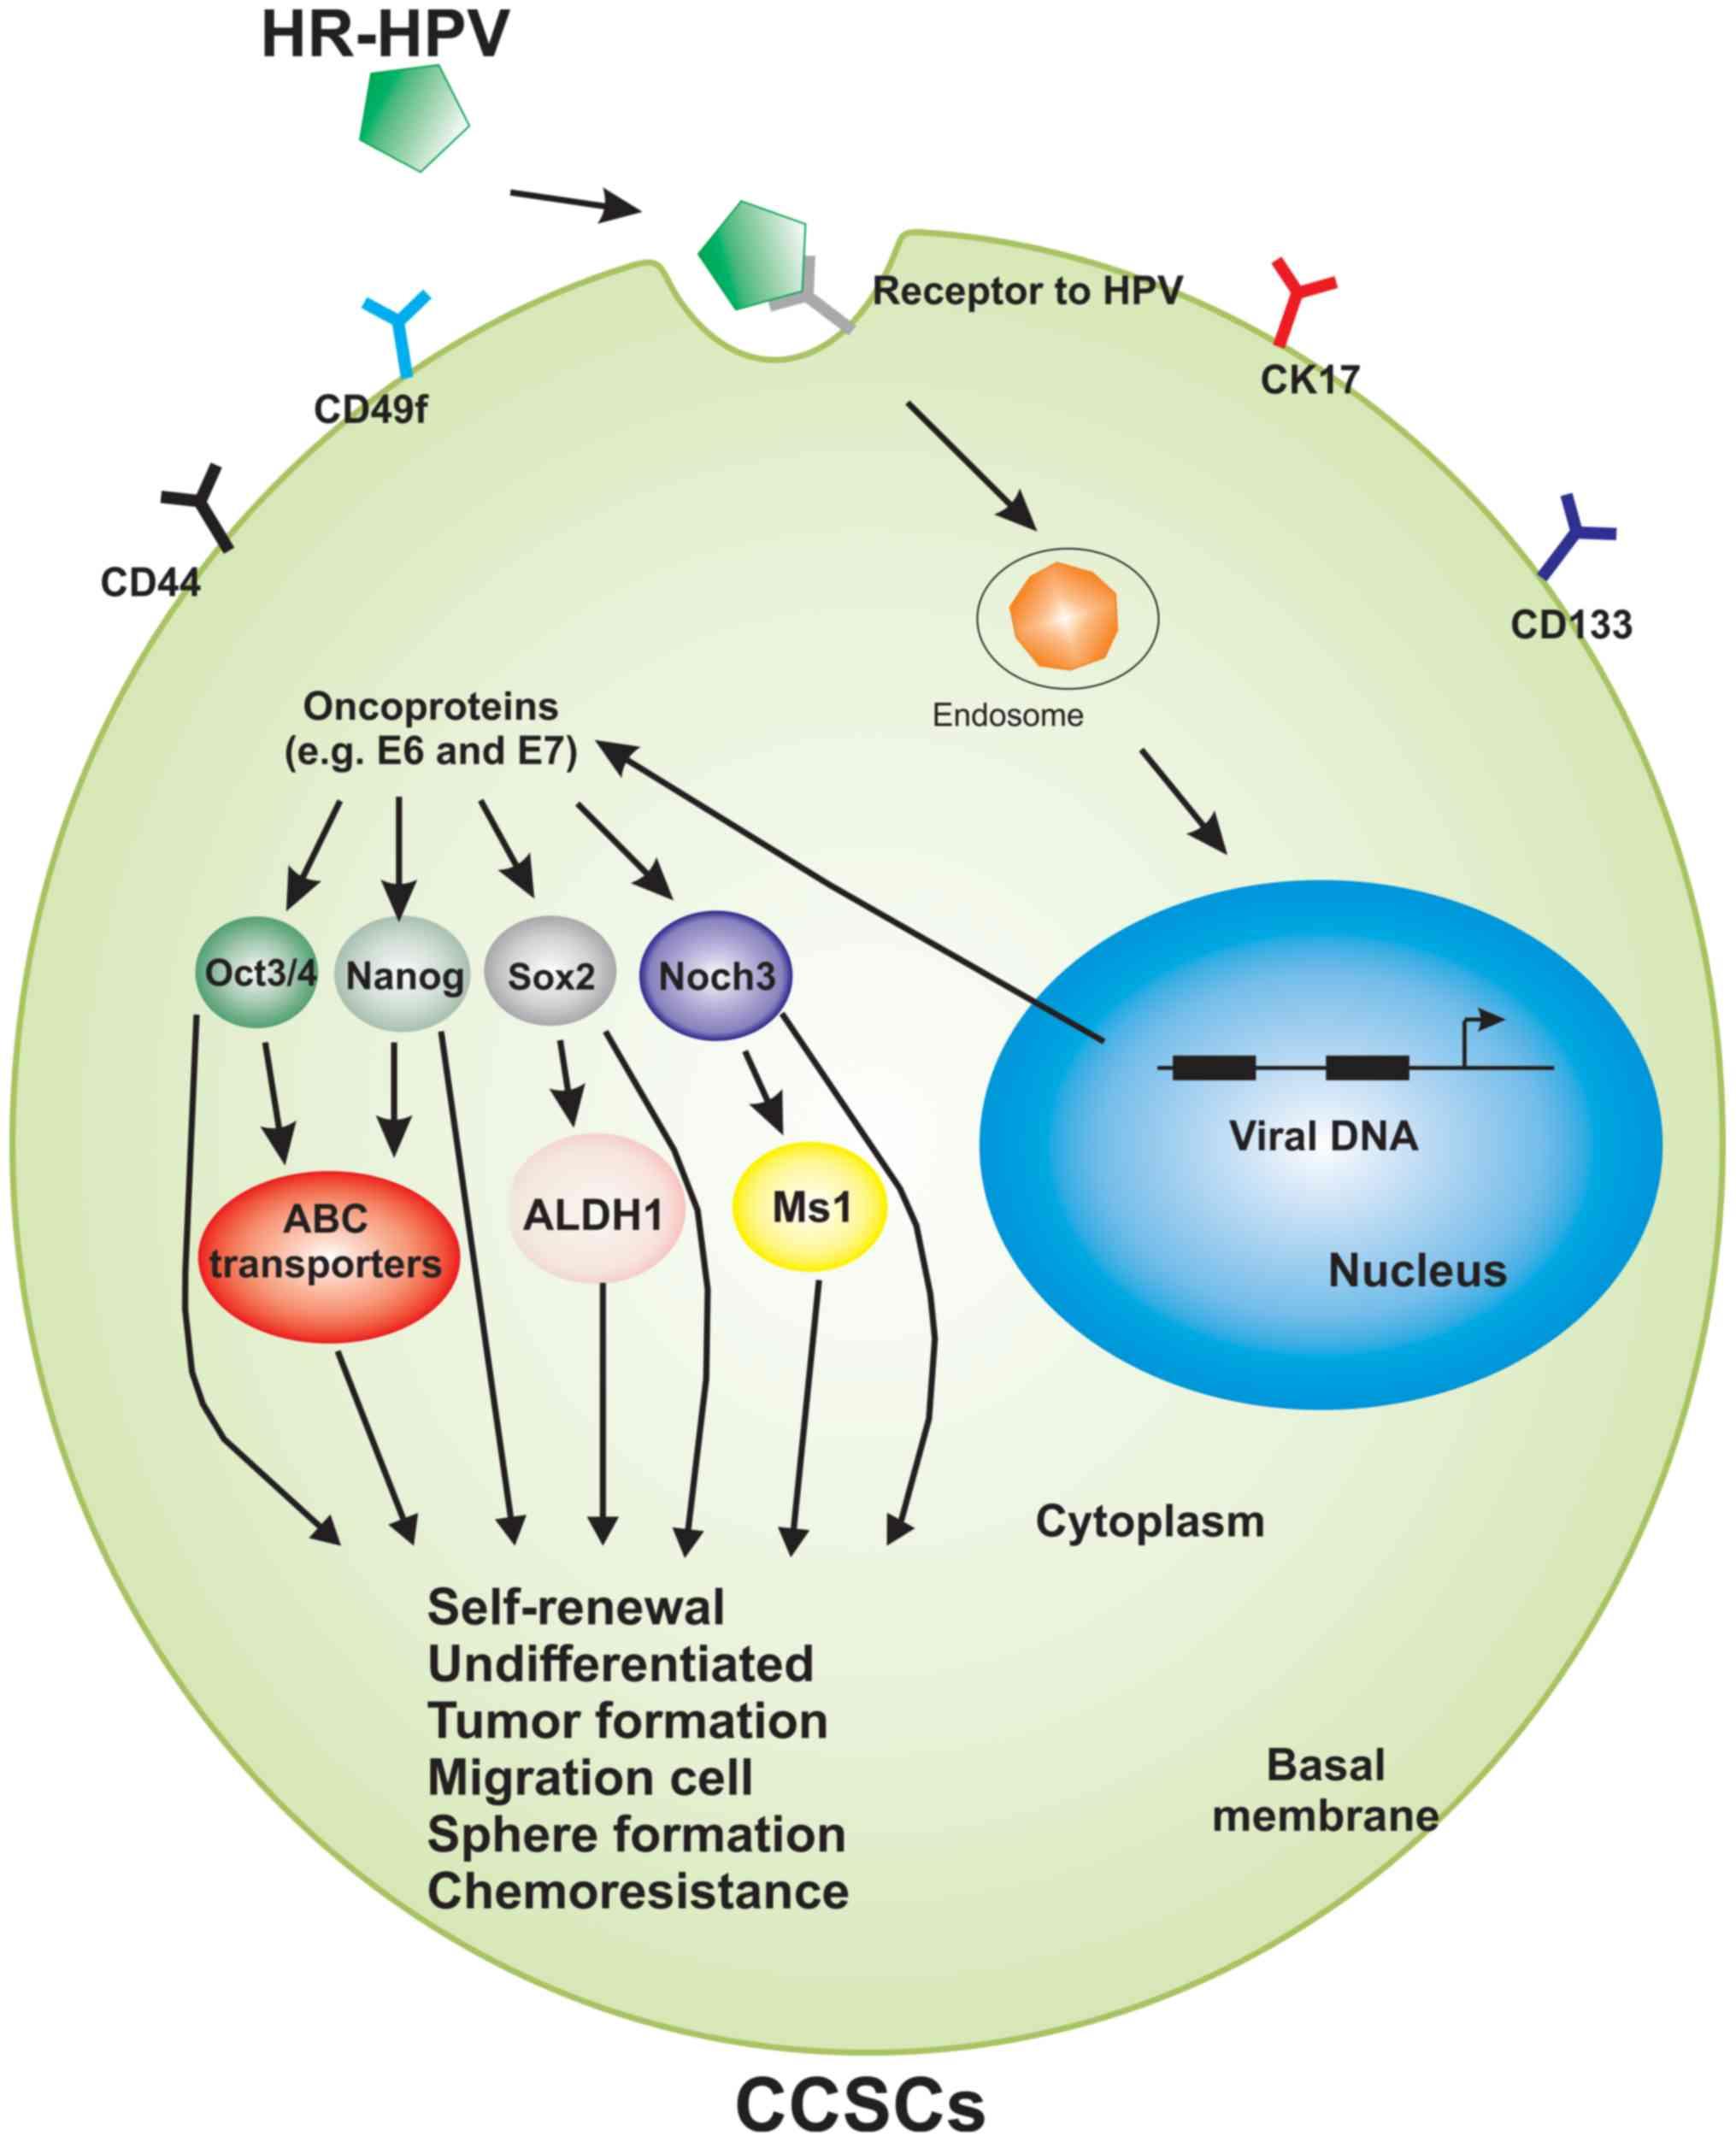 Hpv tumor model, Dysbiosis from antibiotics